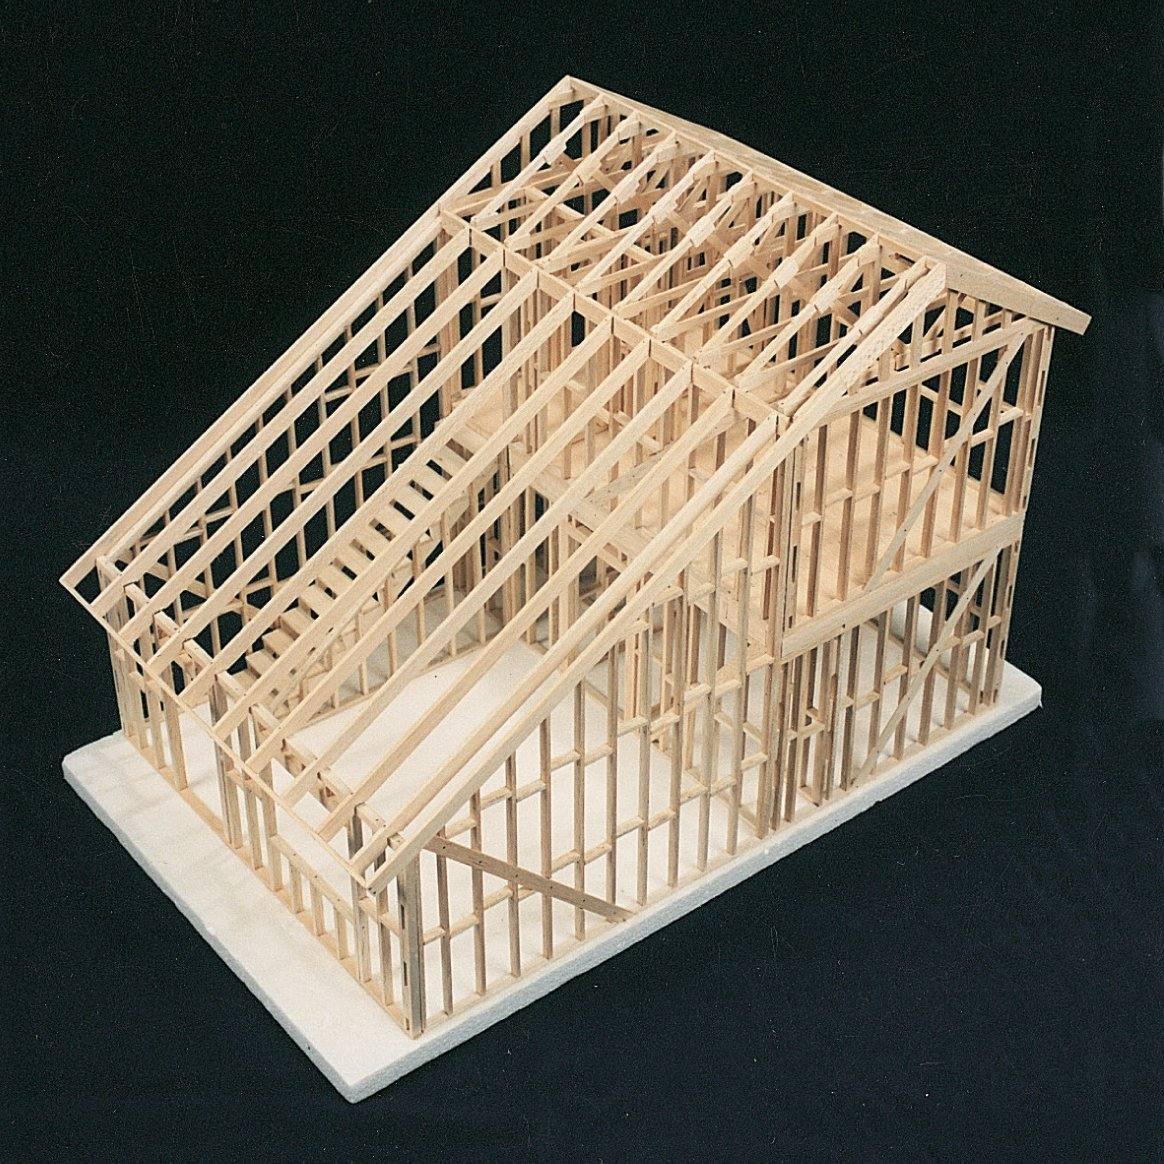 Kit De Brodhead Garrett De Dos Pisos Casa Framing - $ 3,632.84 en ...